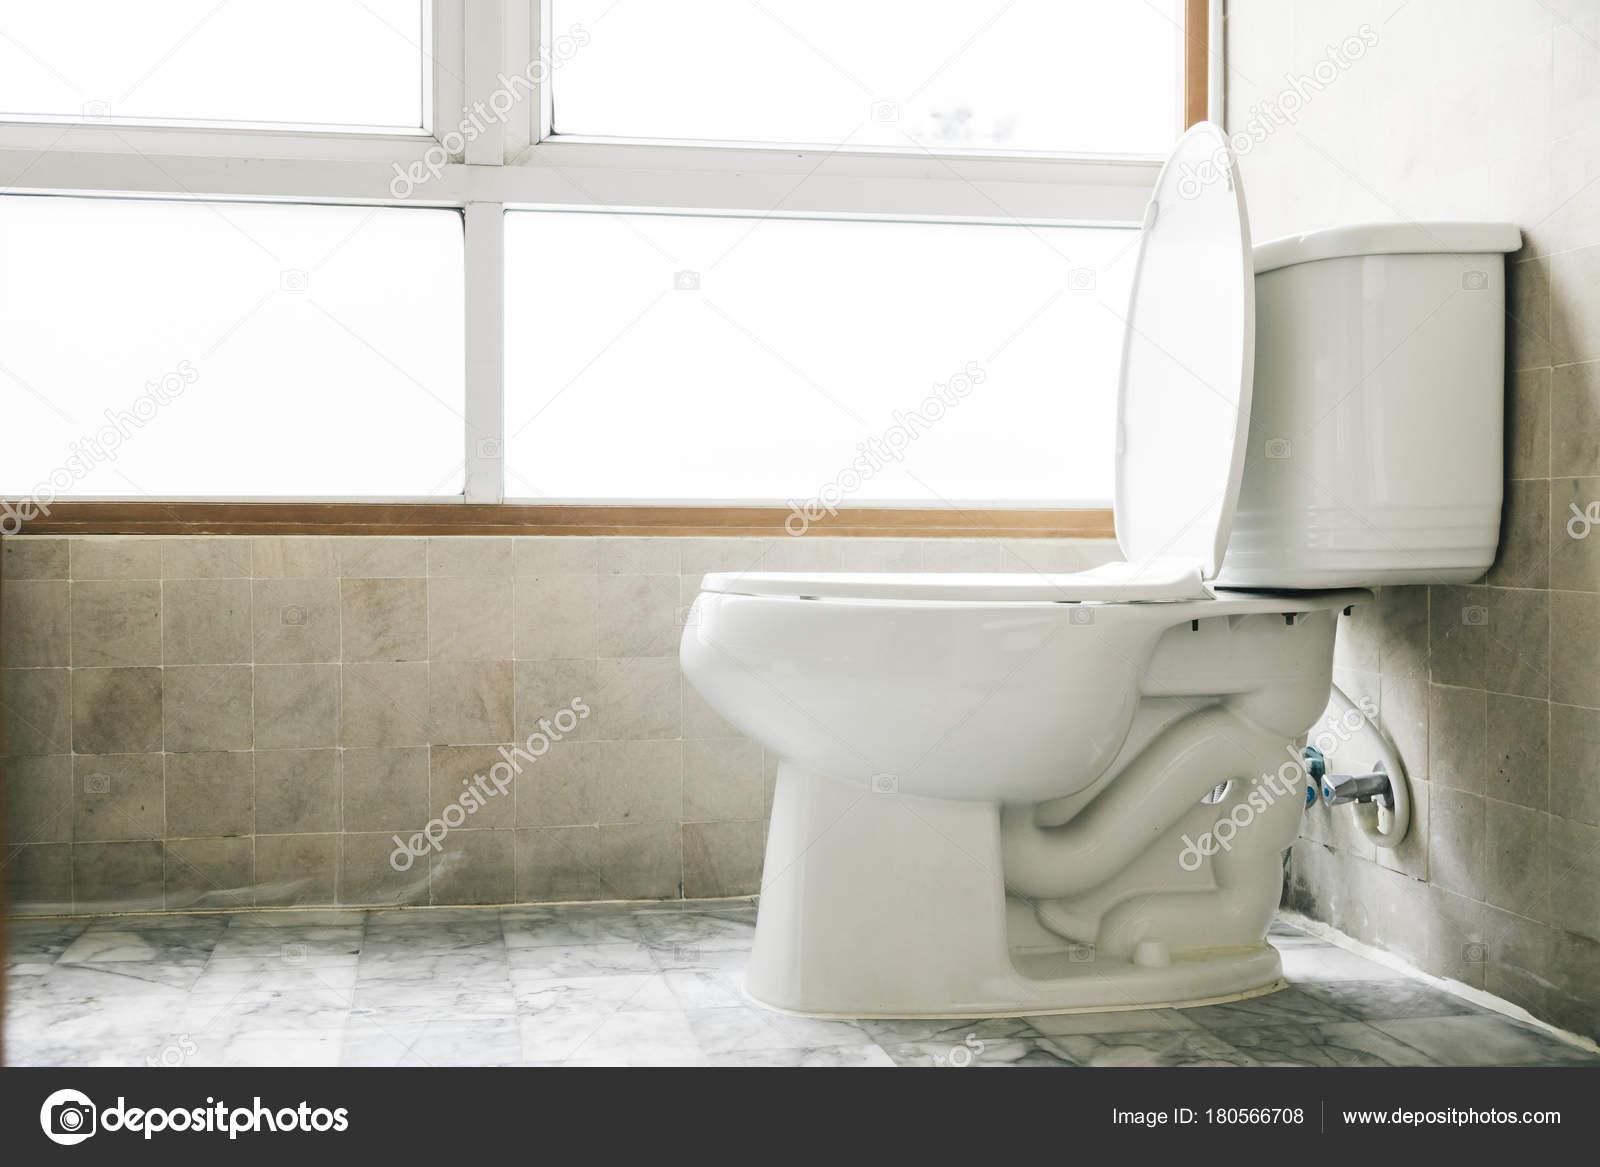 Sedili Wc Per Disabili : Decorazione di sedile wc in bagno u2014 foto stock © mrsiraphol #180566708